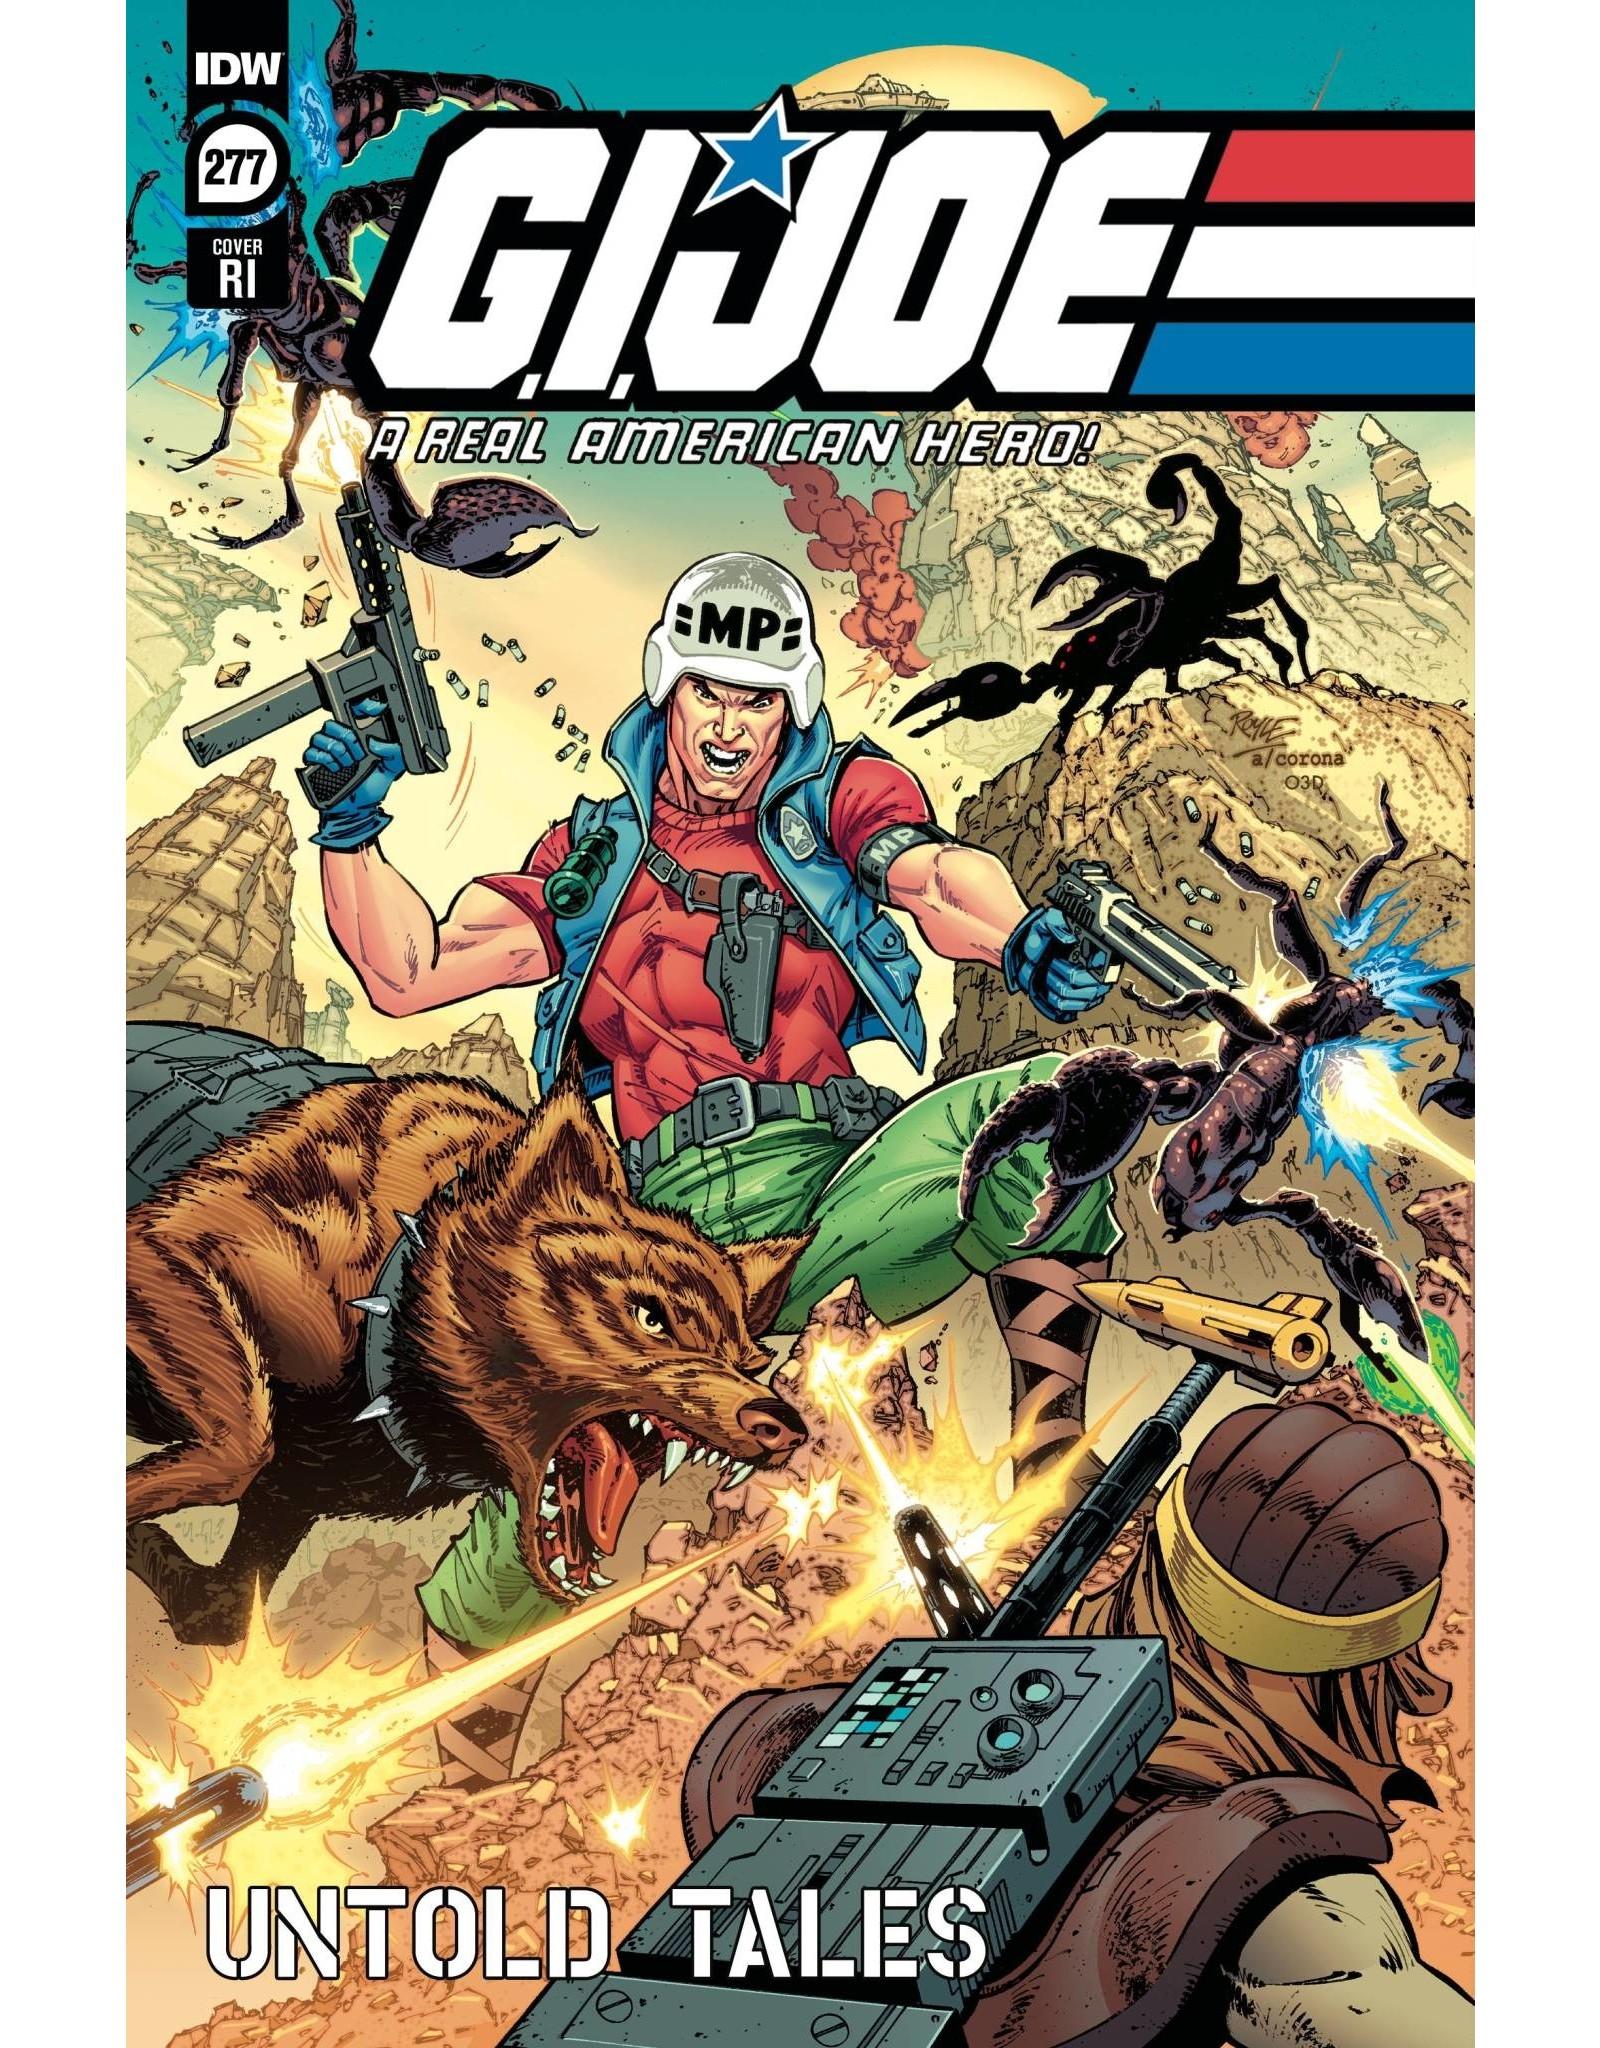 IDW PUBLISHING GI JOE A REAL AMERICAN HERO #277 1:10 ROYLE Var